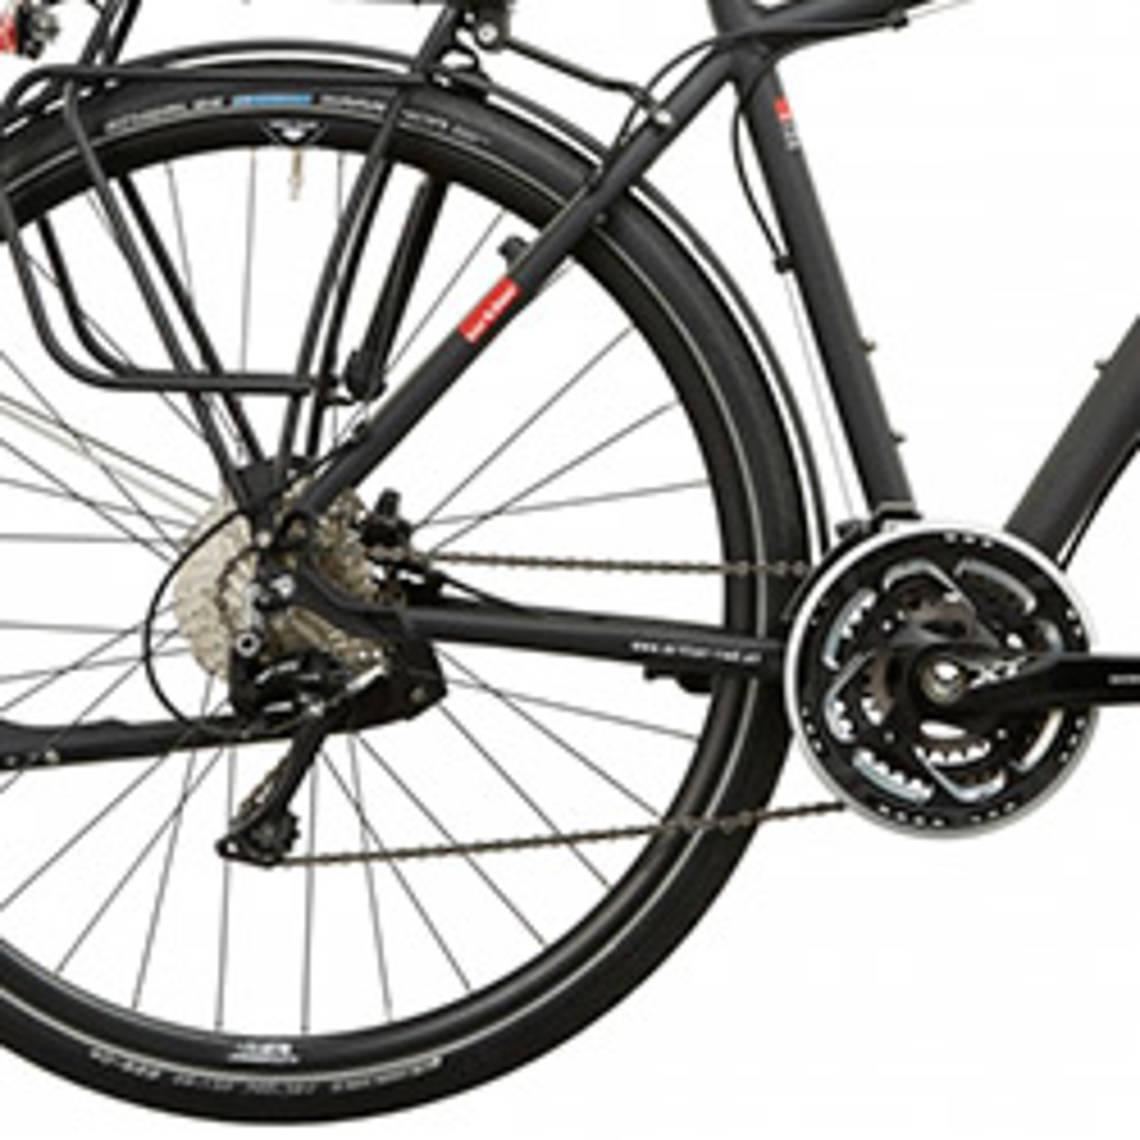 Touringcykel | Cykelvalet